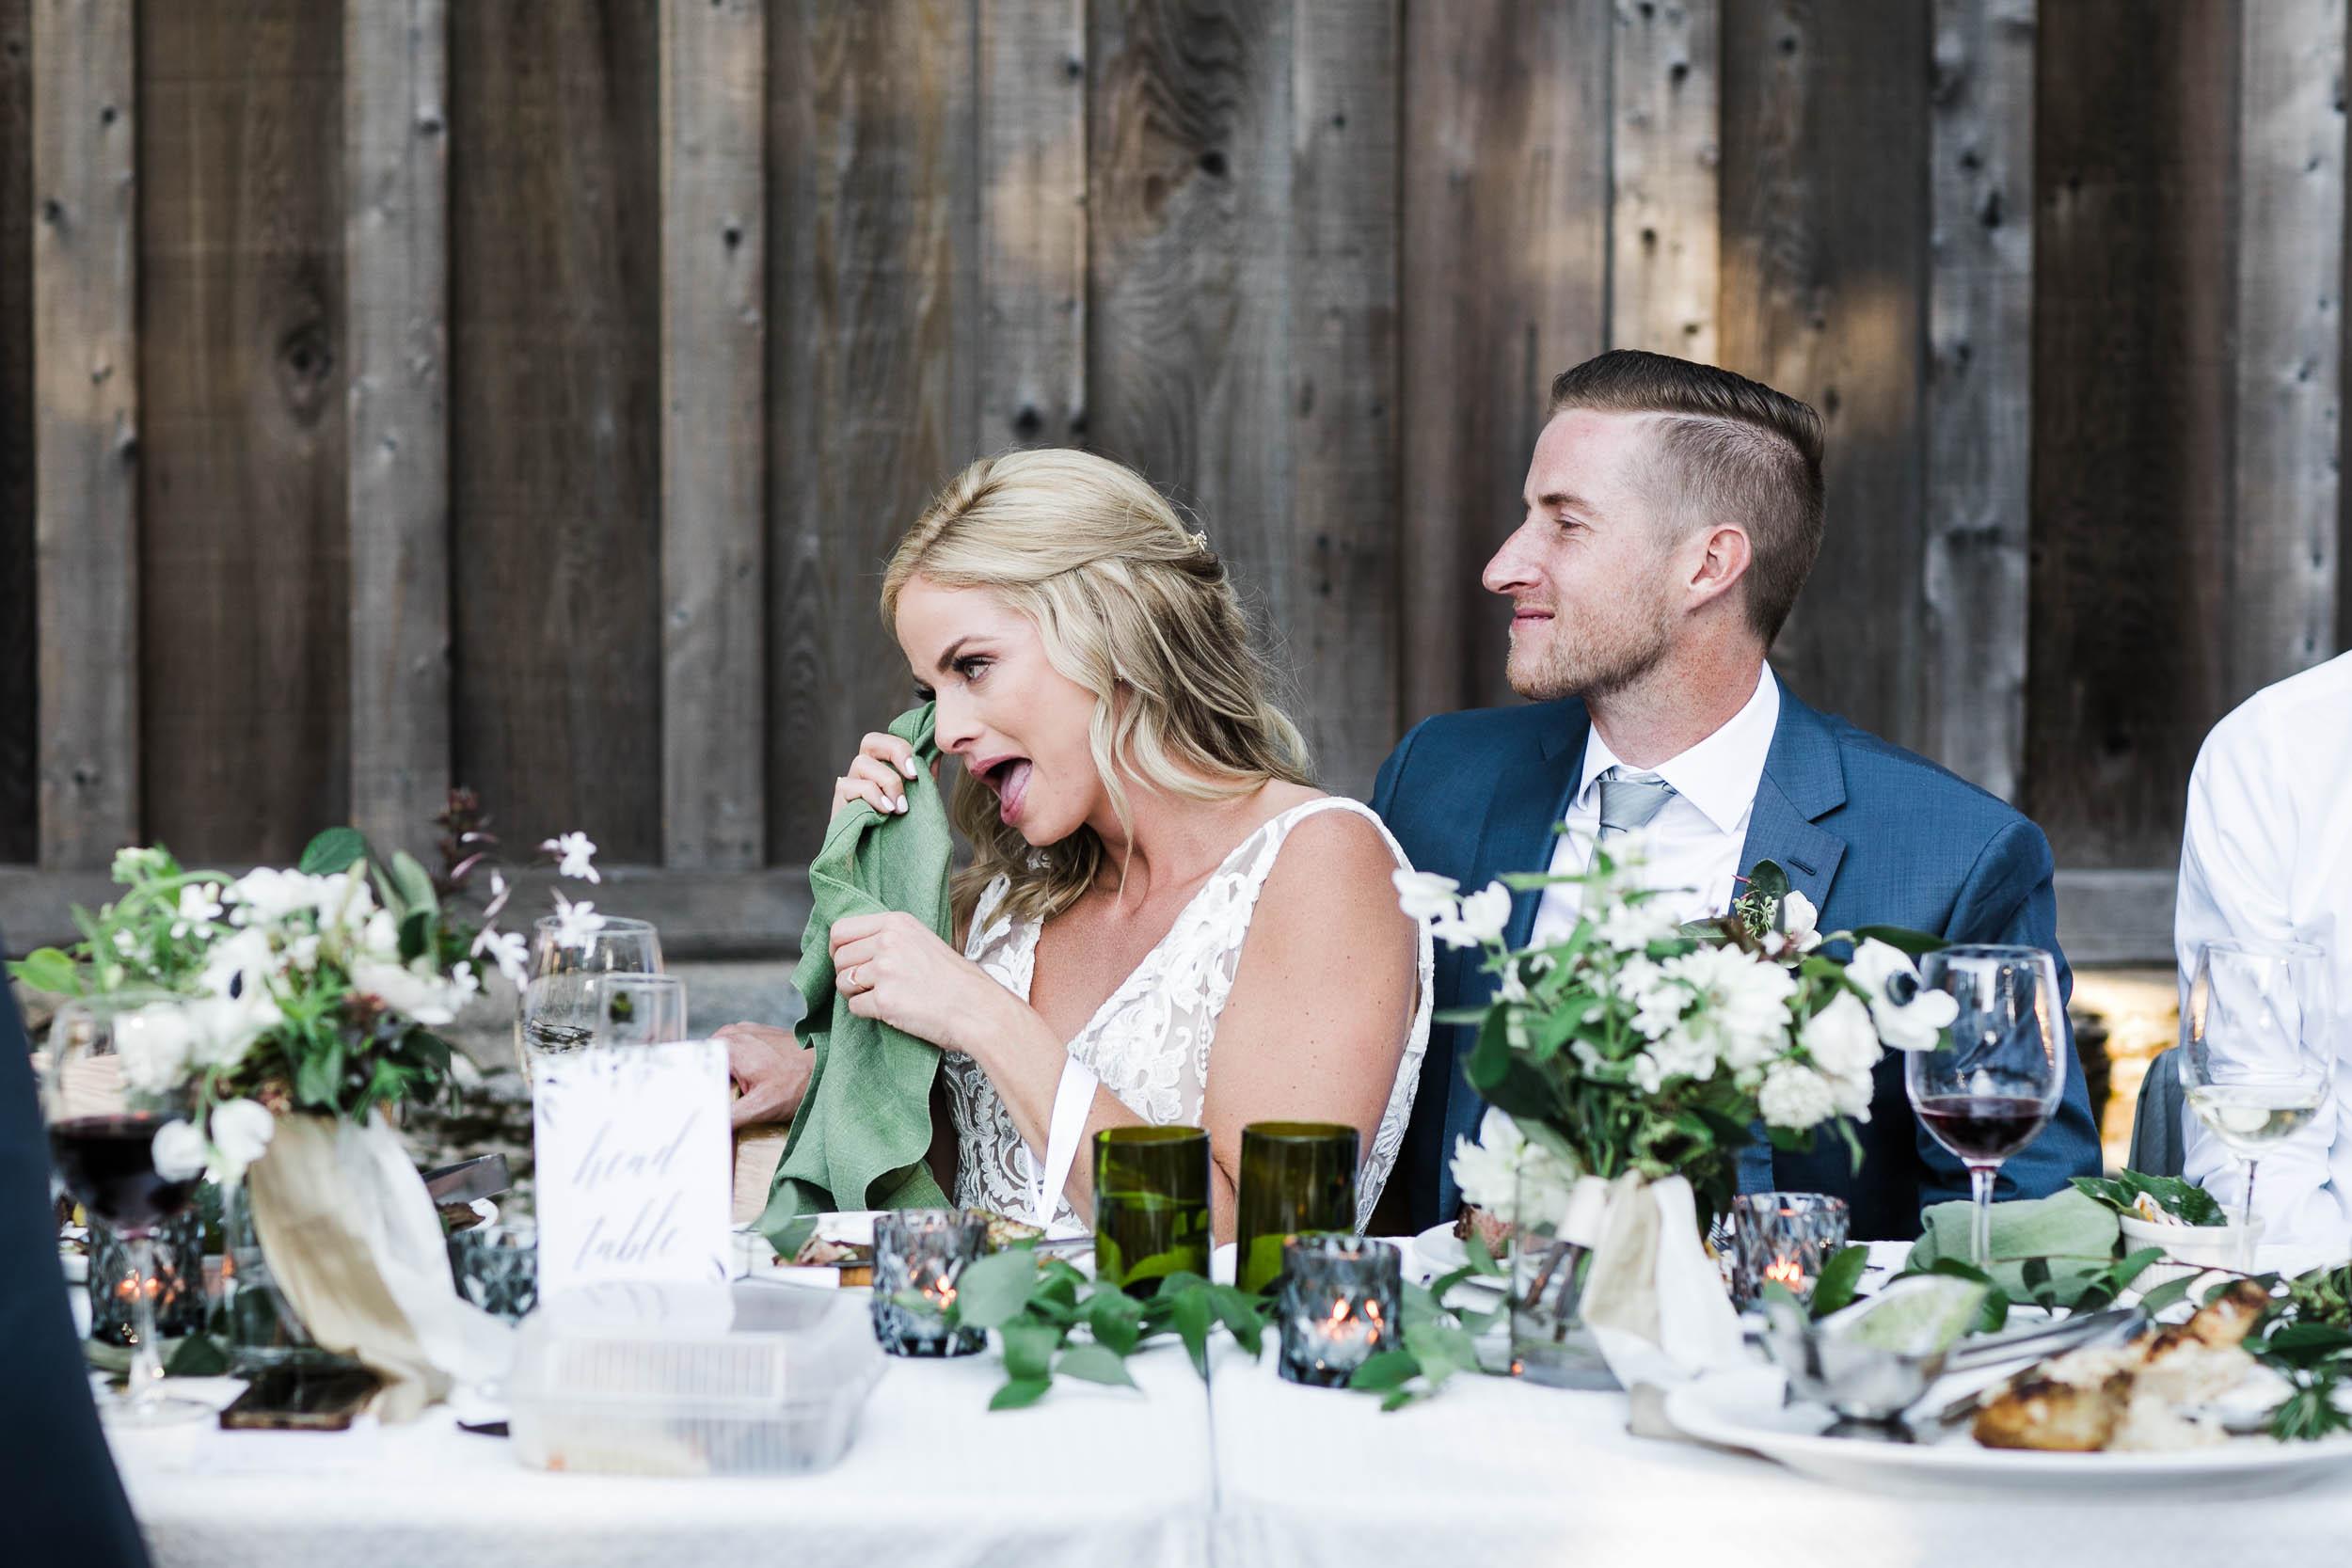 099_072118_D+K_Holman Ranch Wedding_Buena Lane Photography_1216ER.jpg